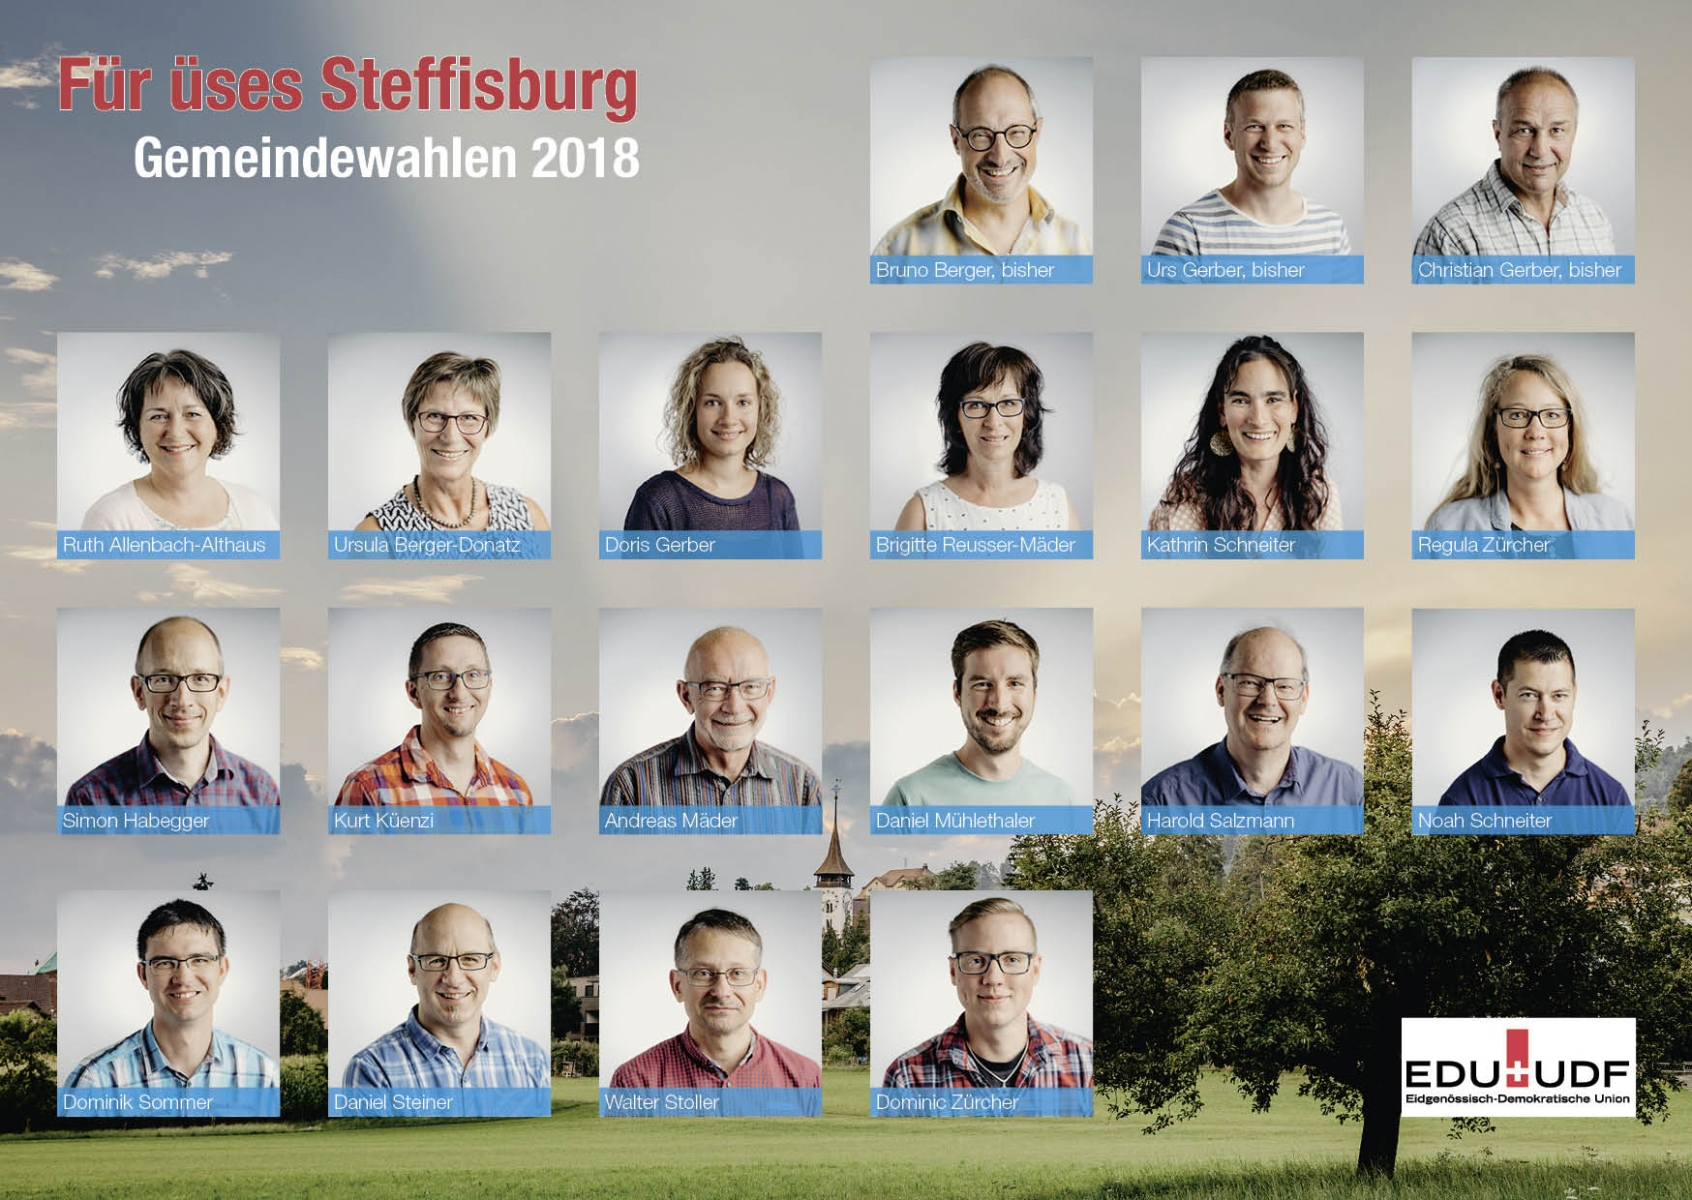 A6-Karte_OHA_Kandidierende EDU Steffisburg_S1